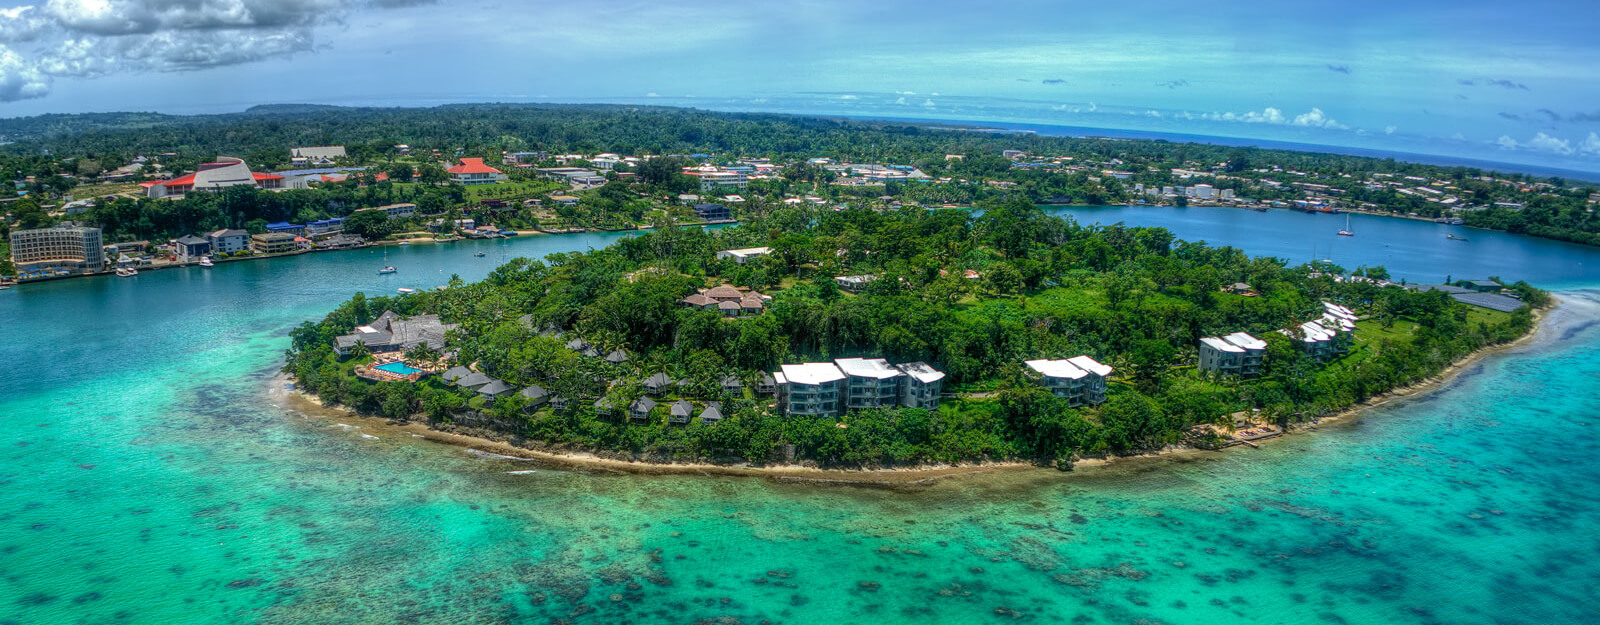 покупка гражданства Вануату за инвестиции